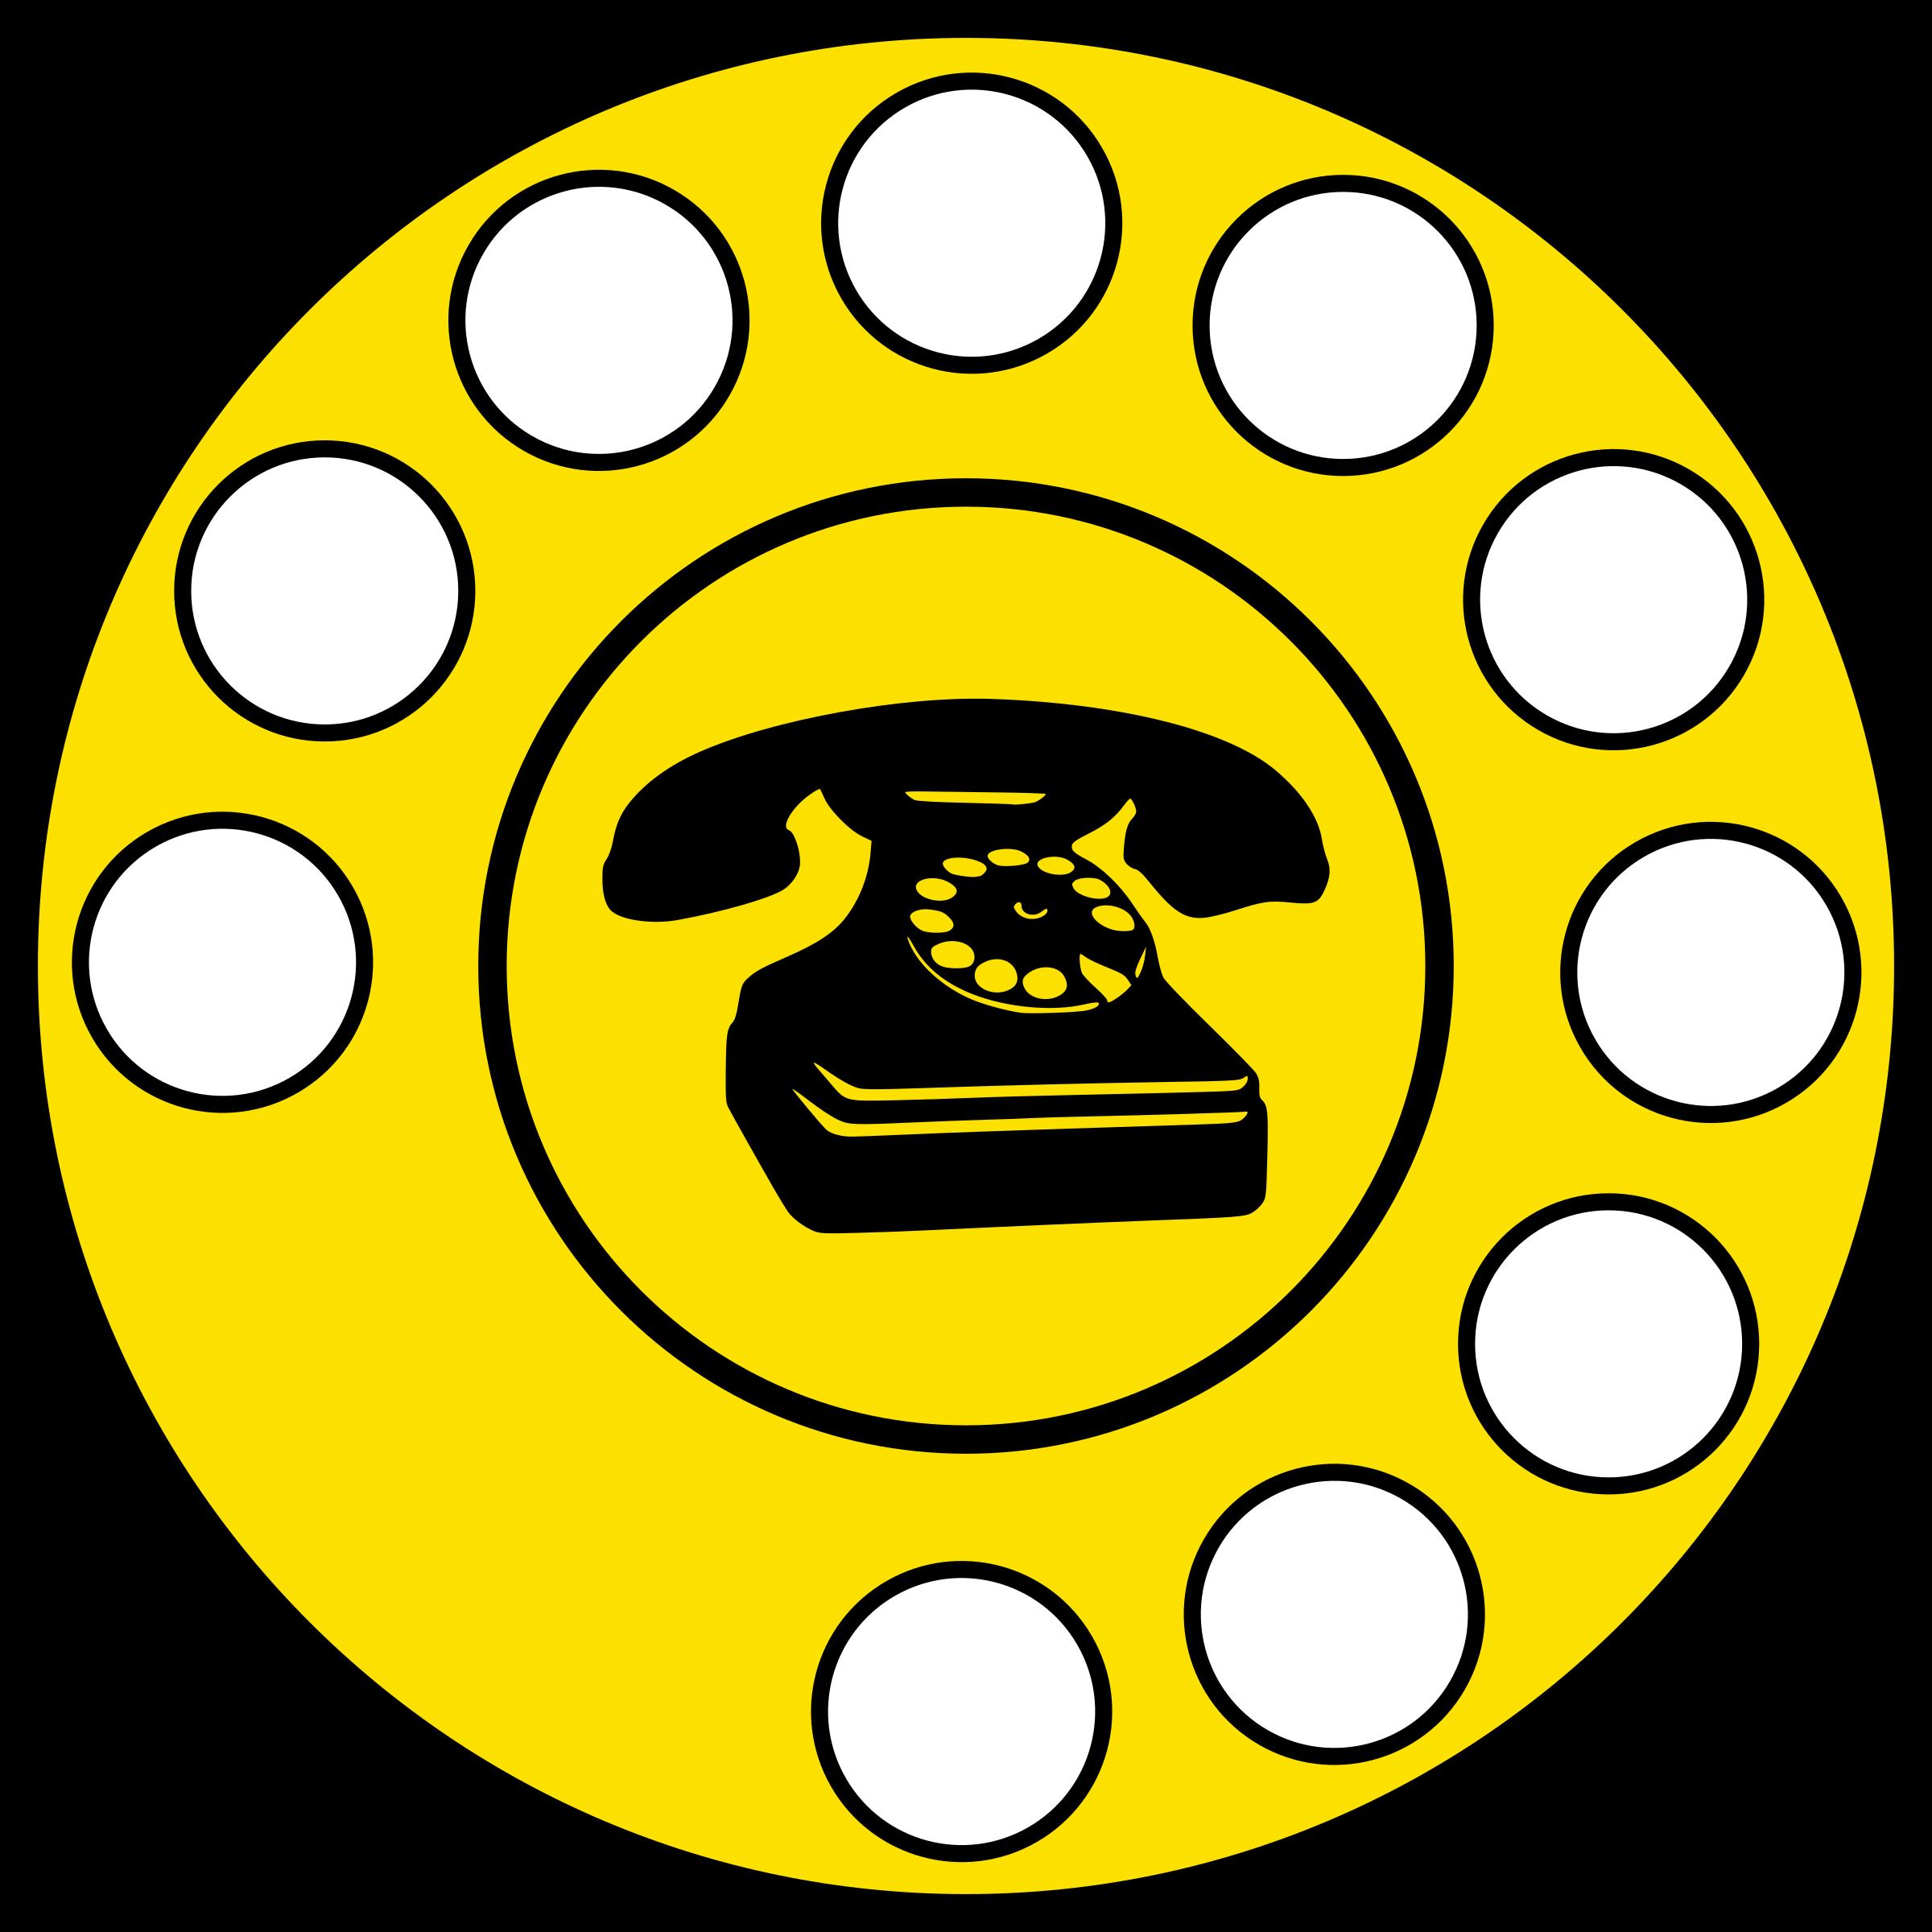 clipart tabella circolare sip clipart telephone masts clipart telephone prayer